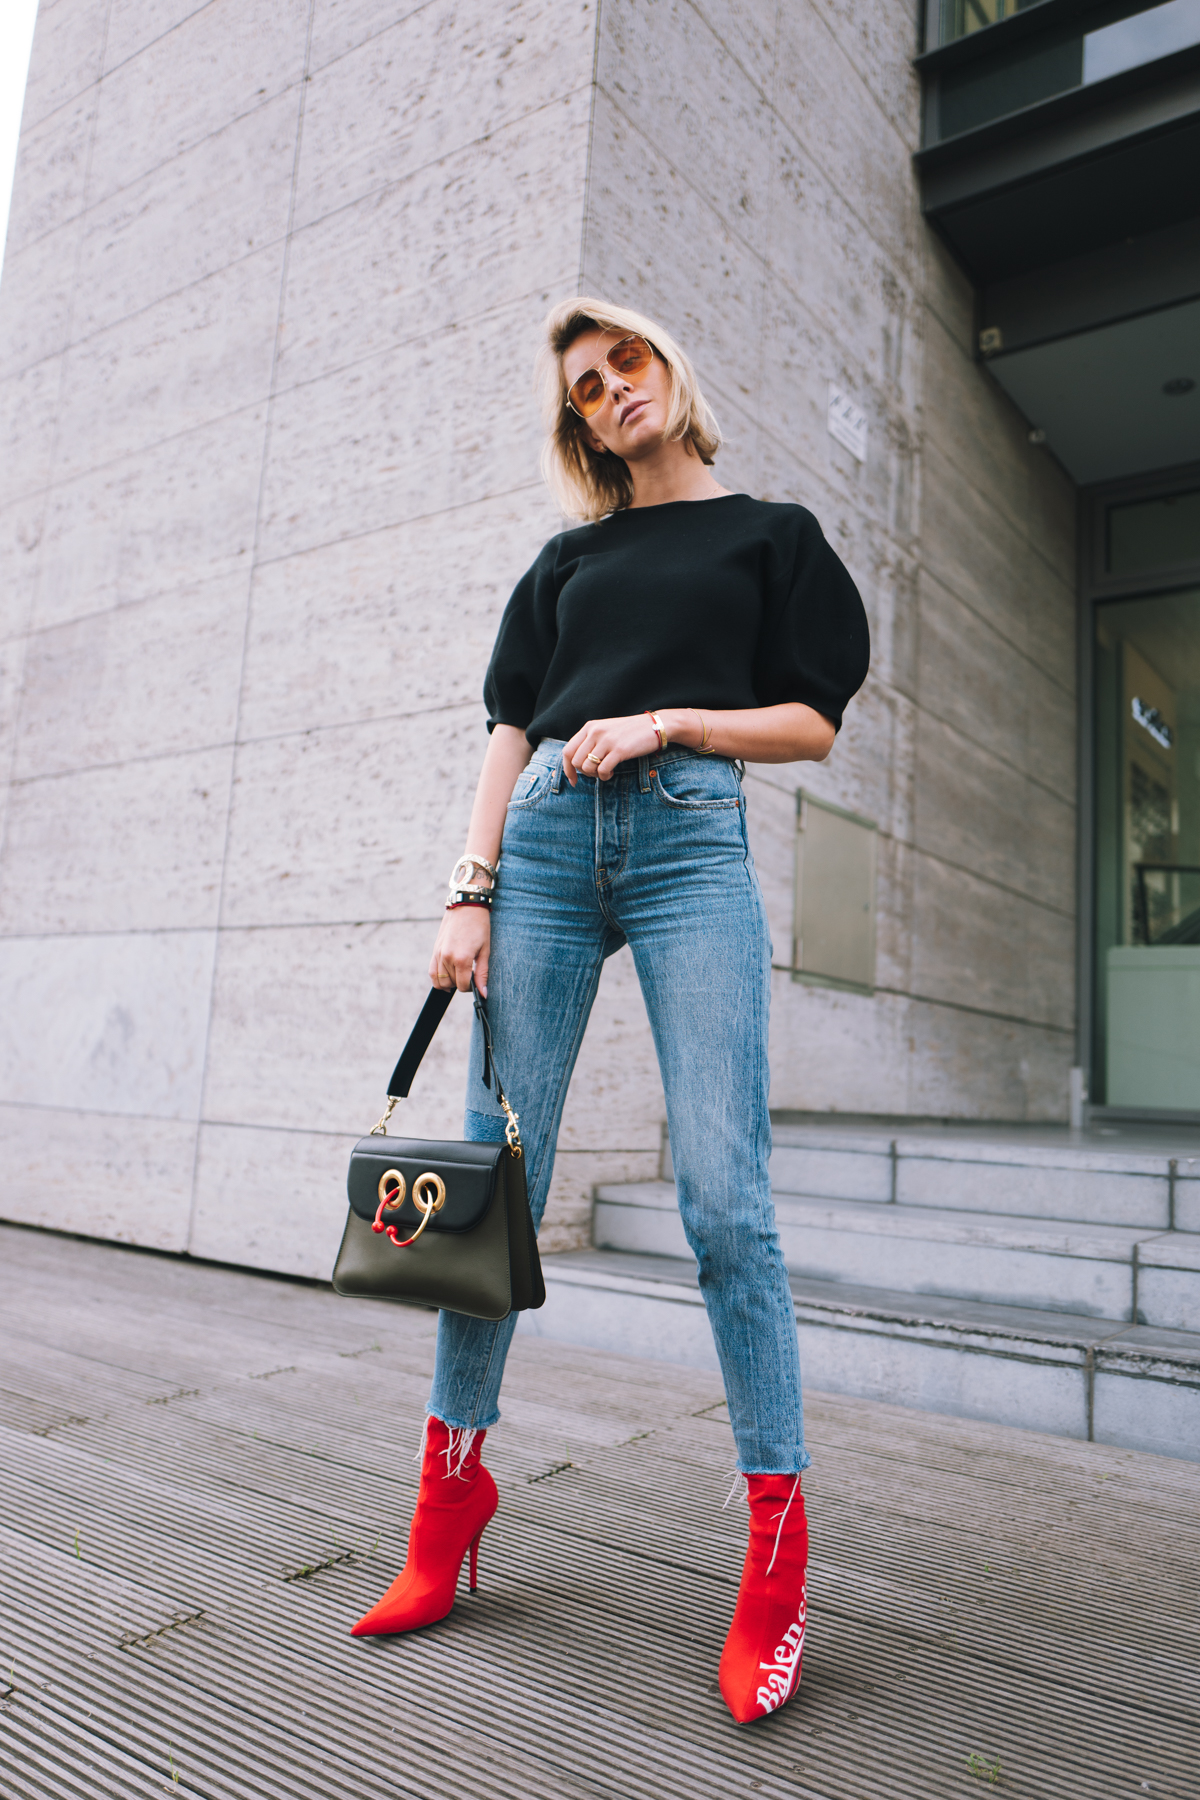 Balenciaga X Colette Knife Boots Outfit Lisa Hahnb 252 Ck